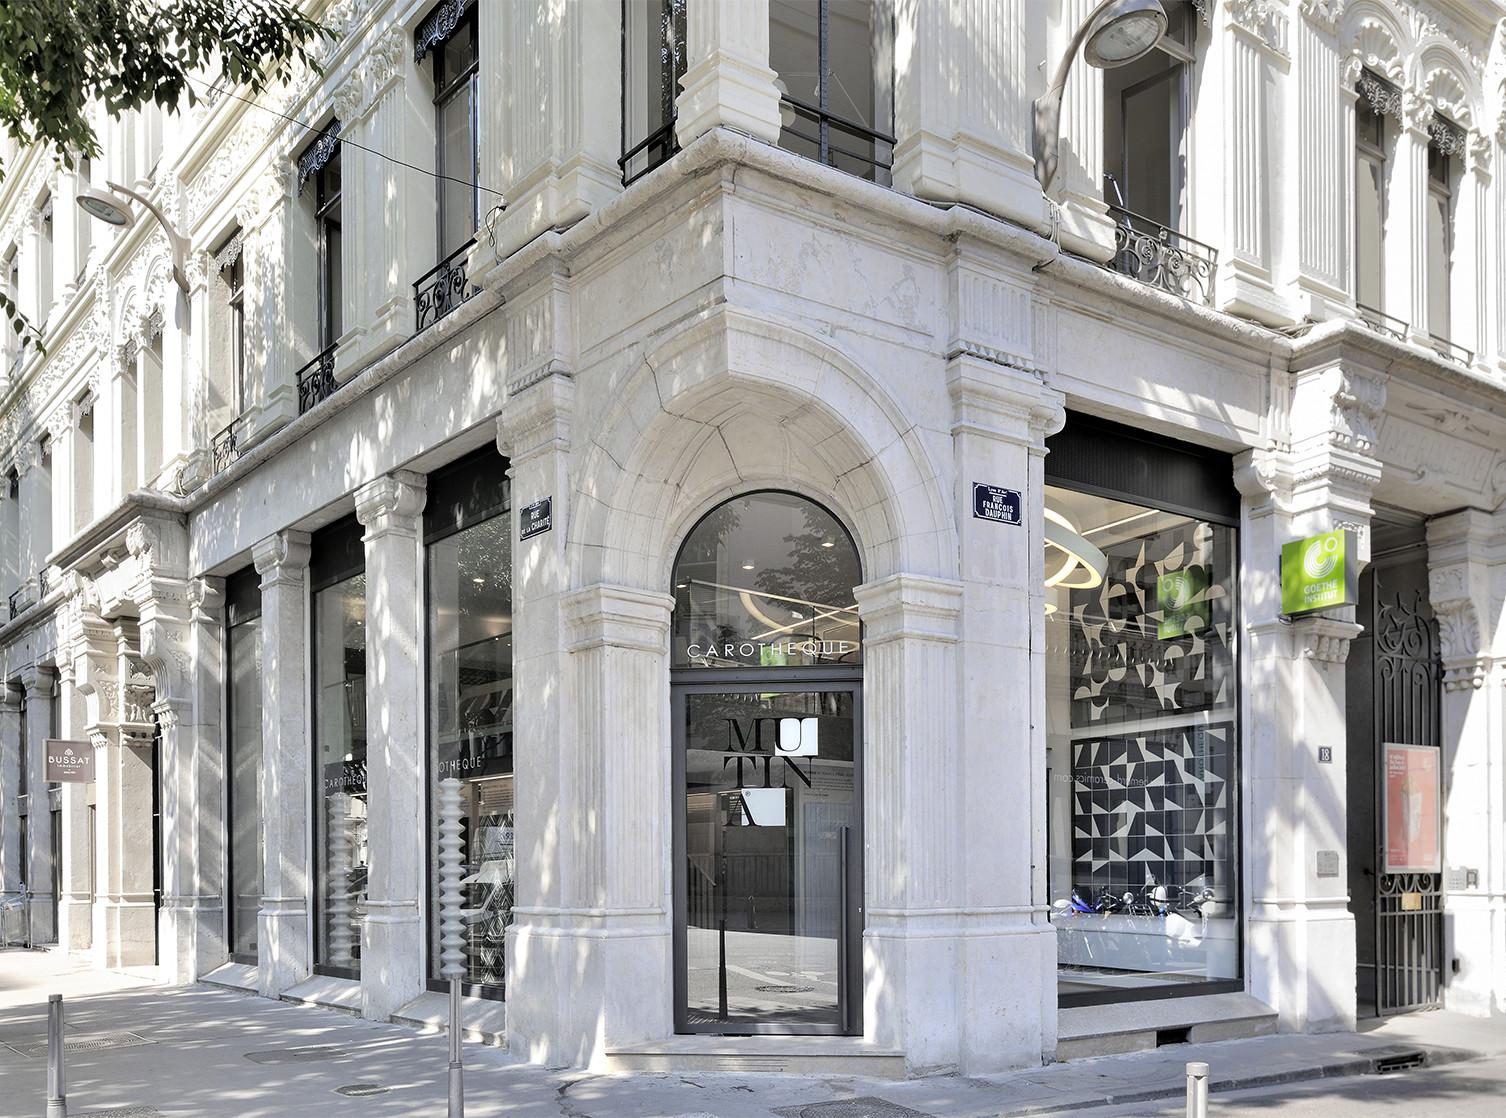 Carothèque Galerie Mutina Lyon Shop Design